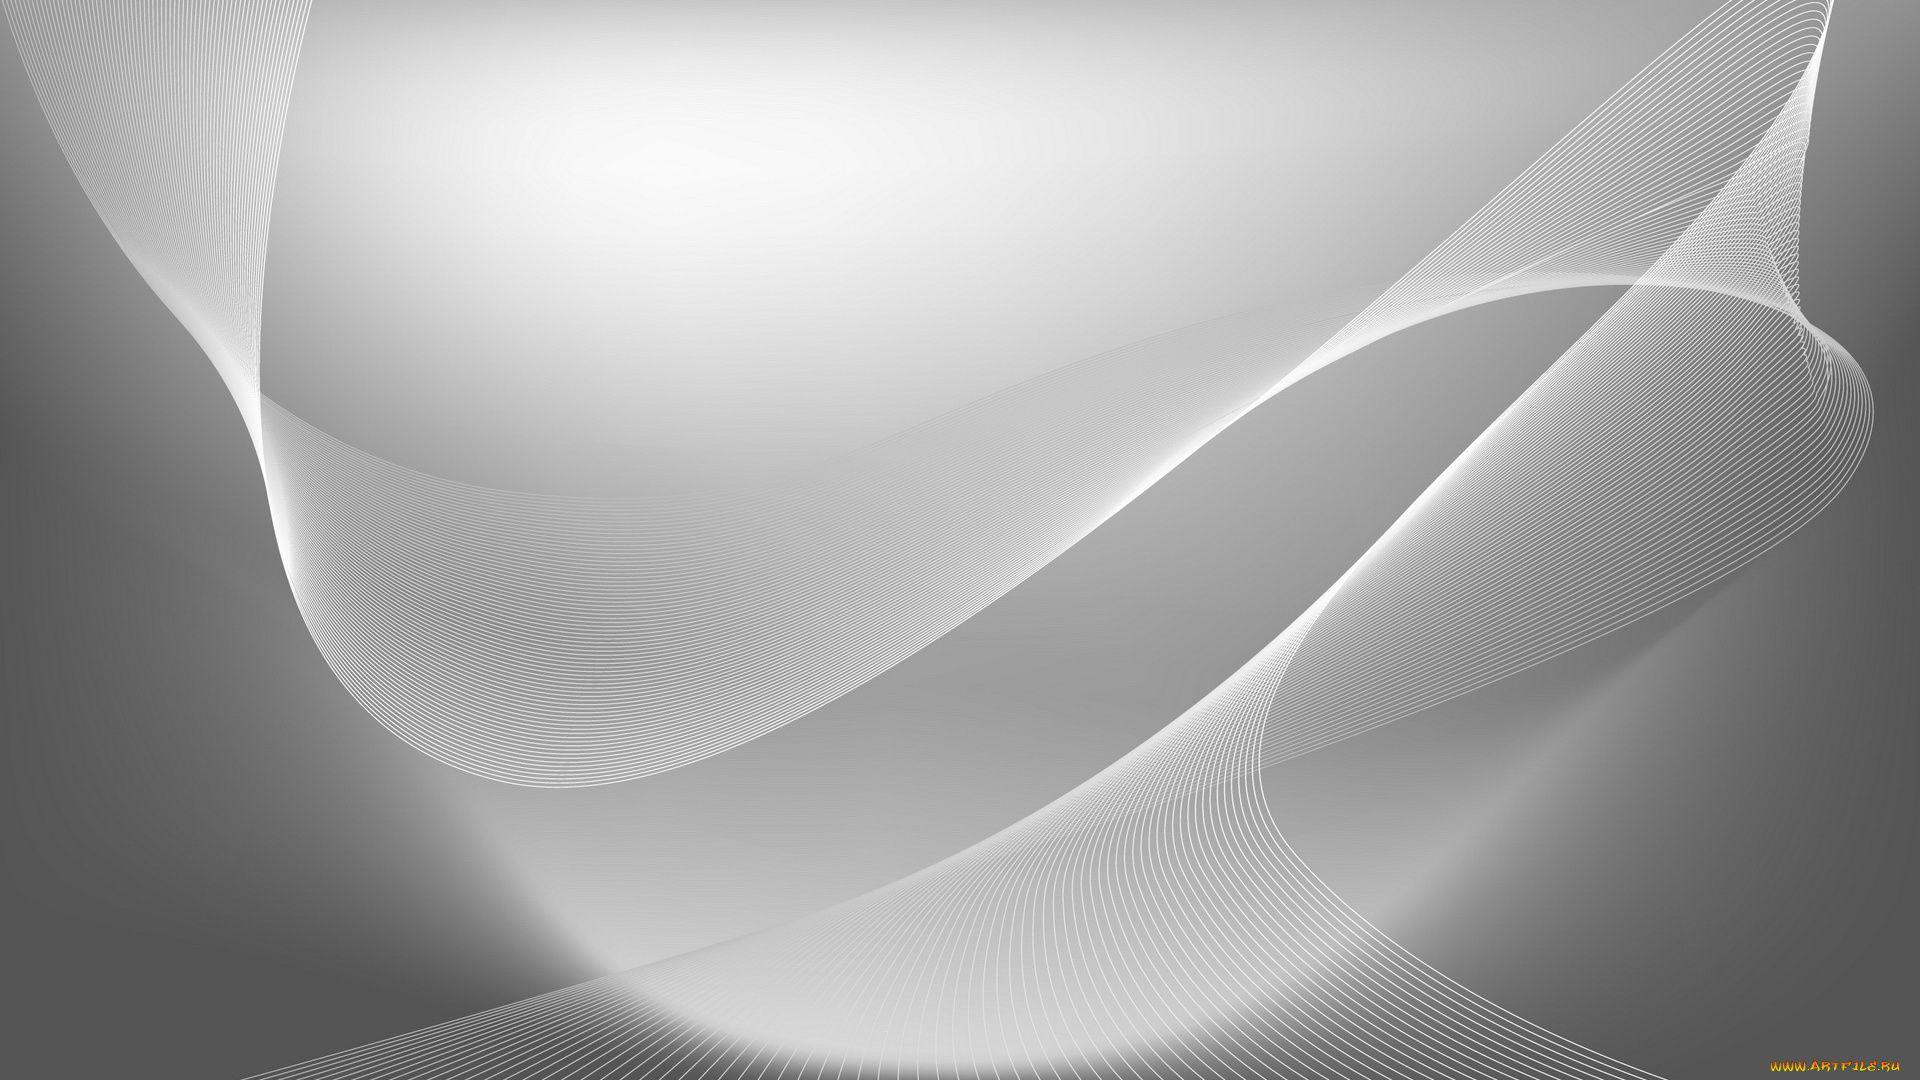 Light Grey wallpaper photo hd